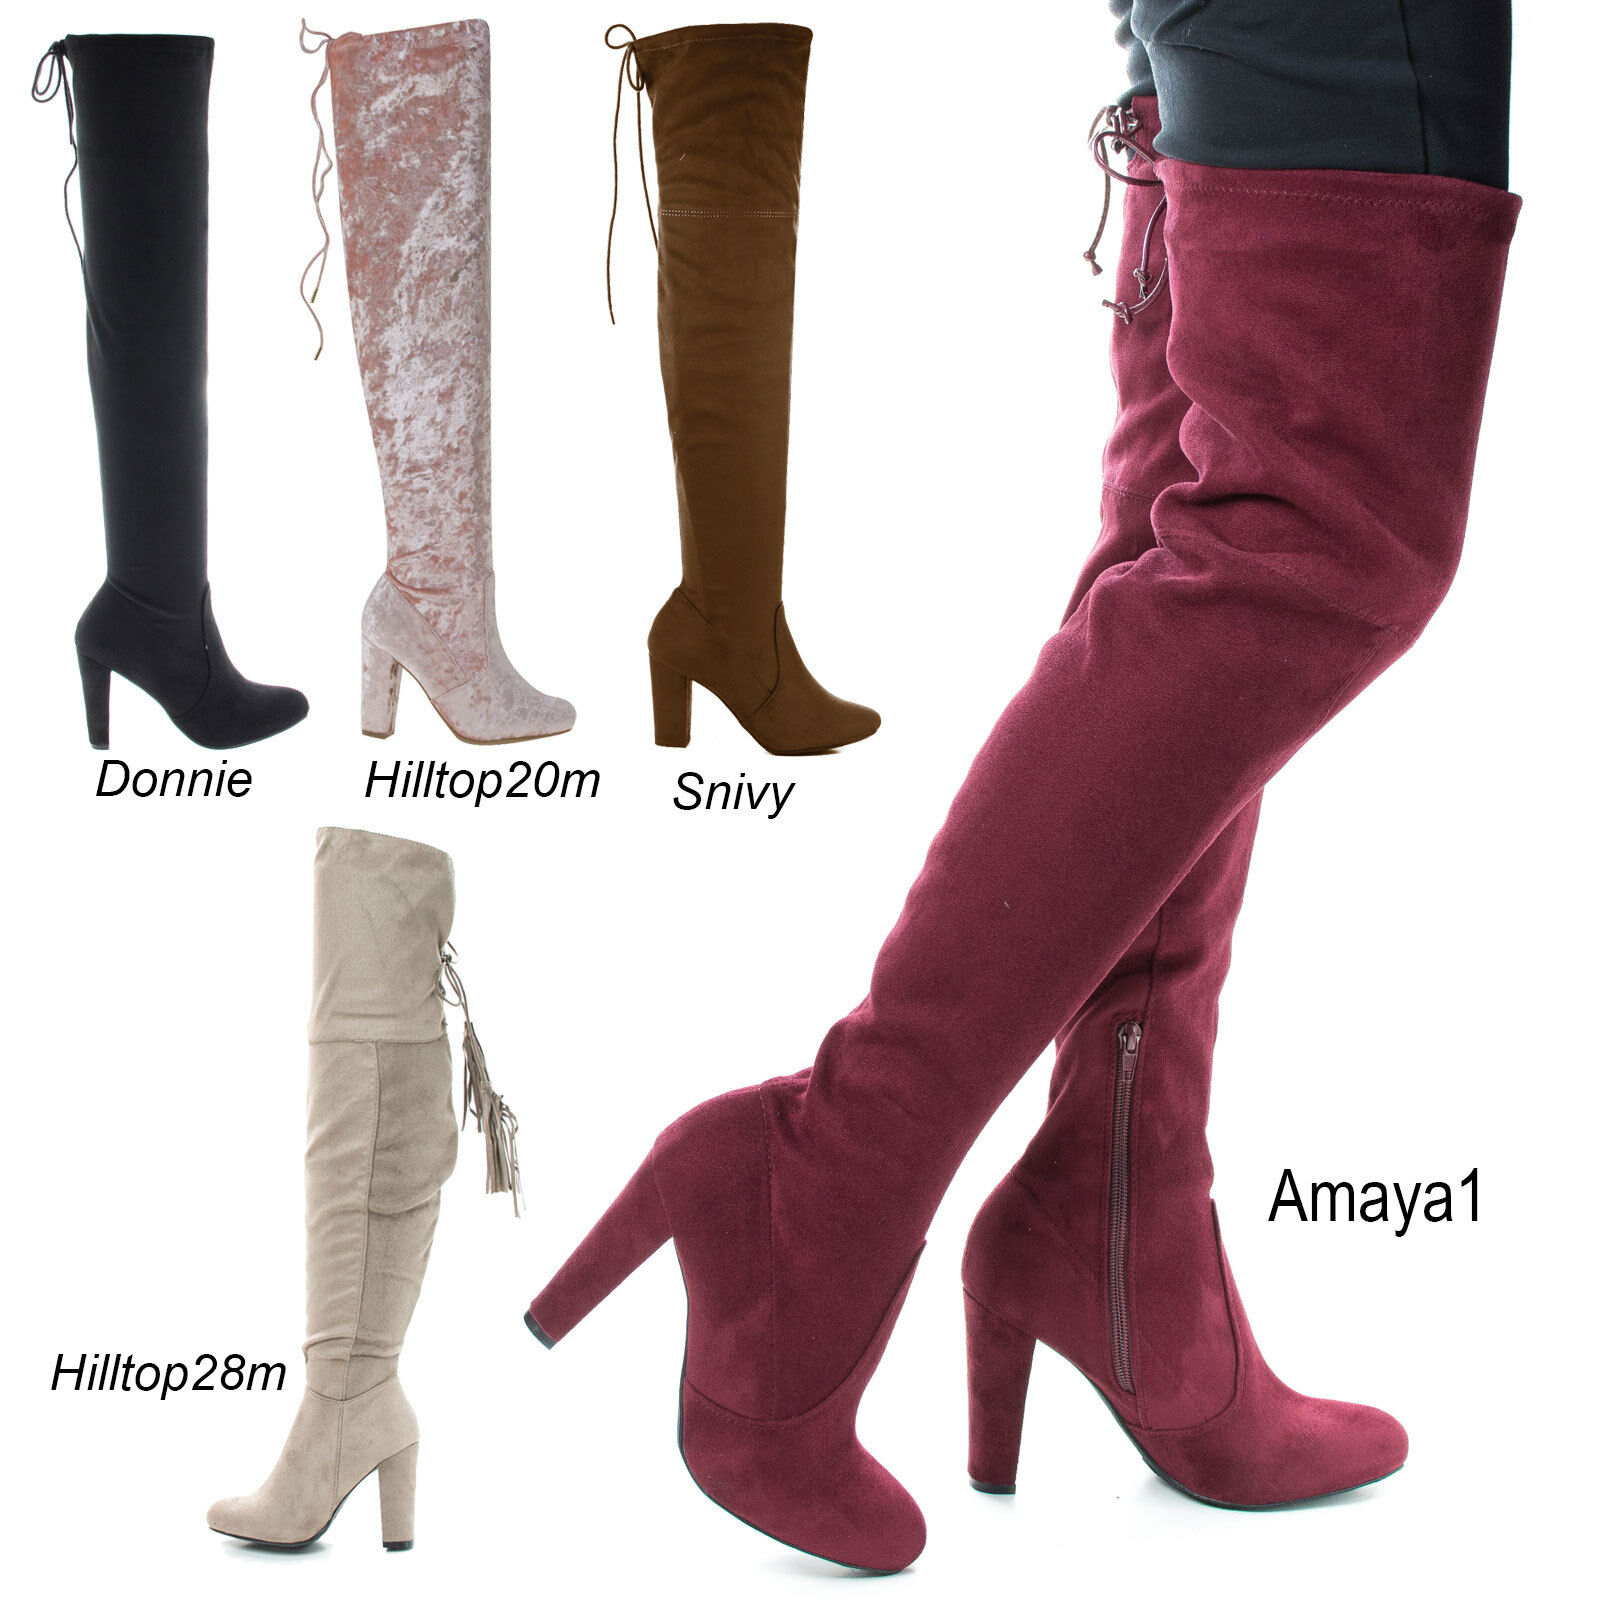 Amaya1 Over The Knee High Heel Boots